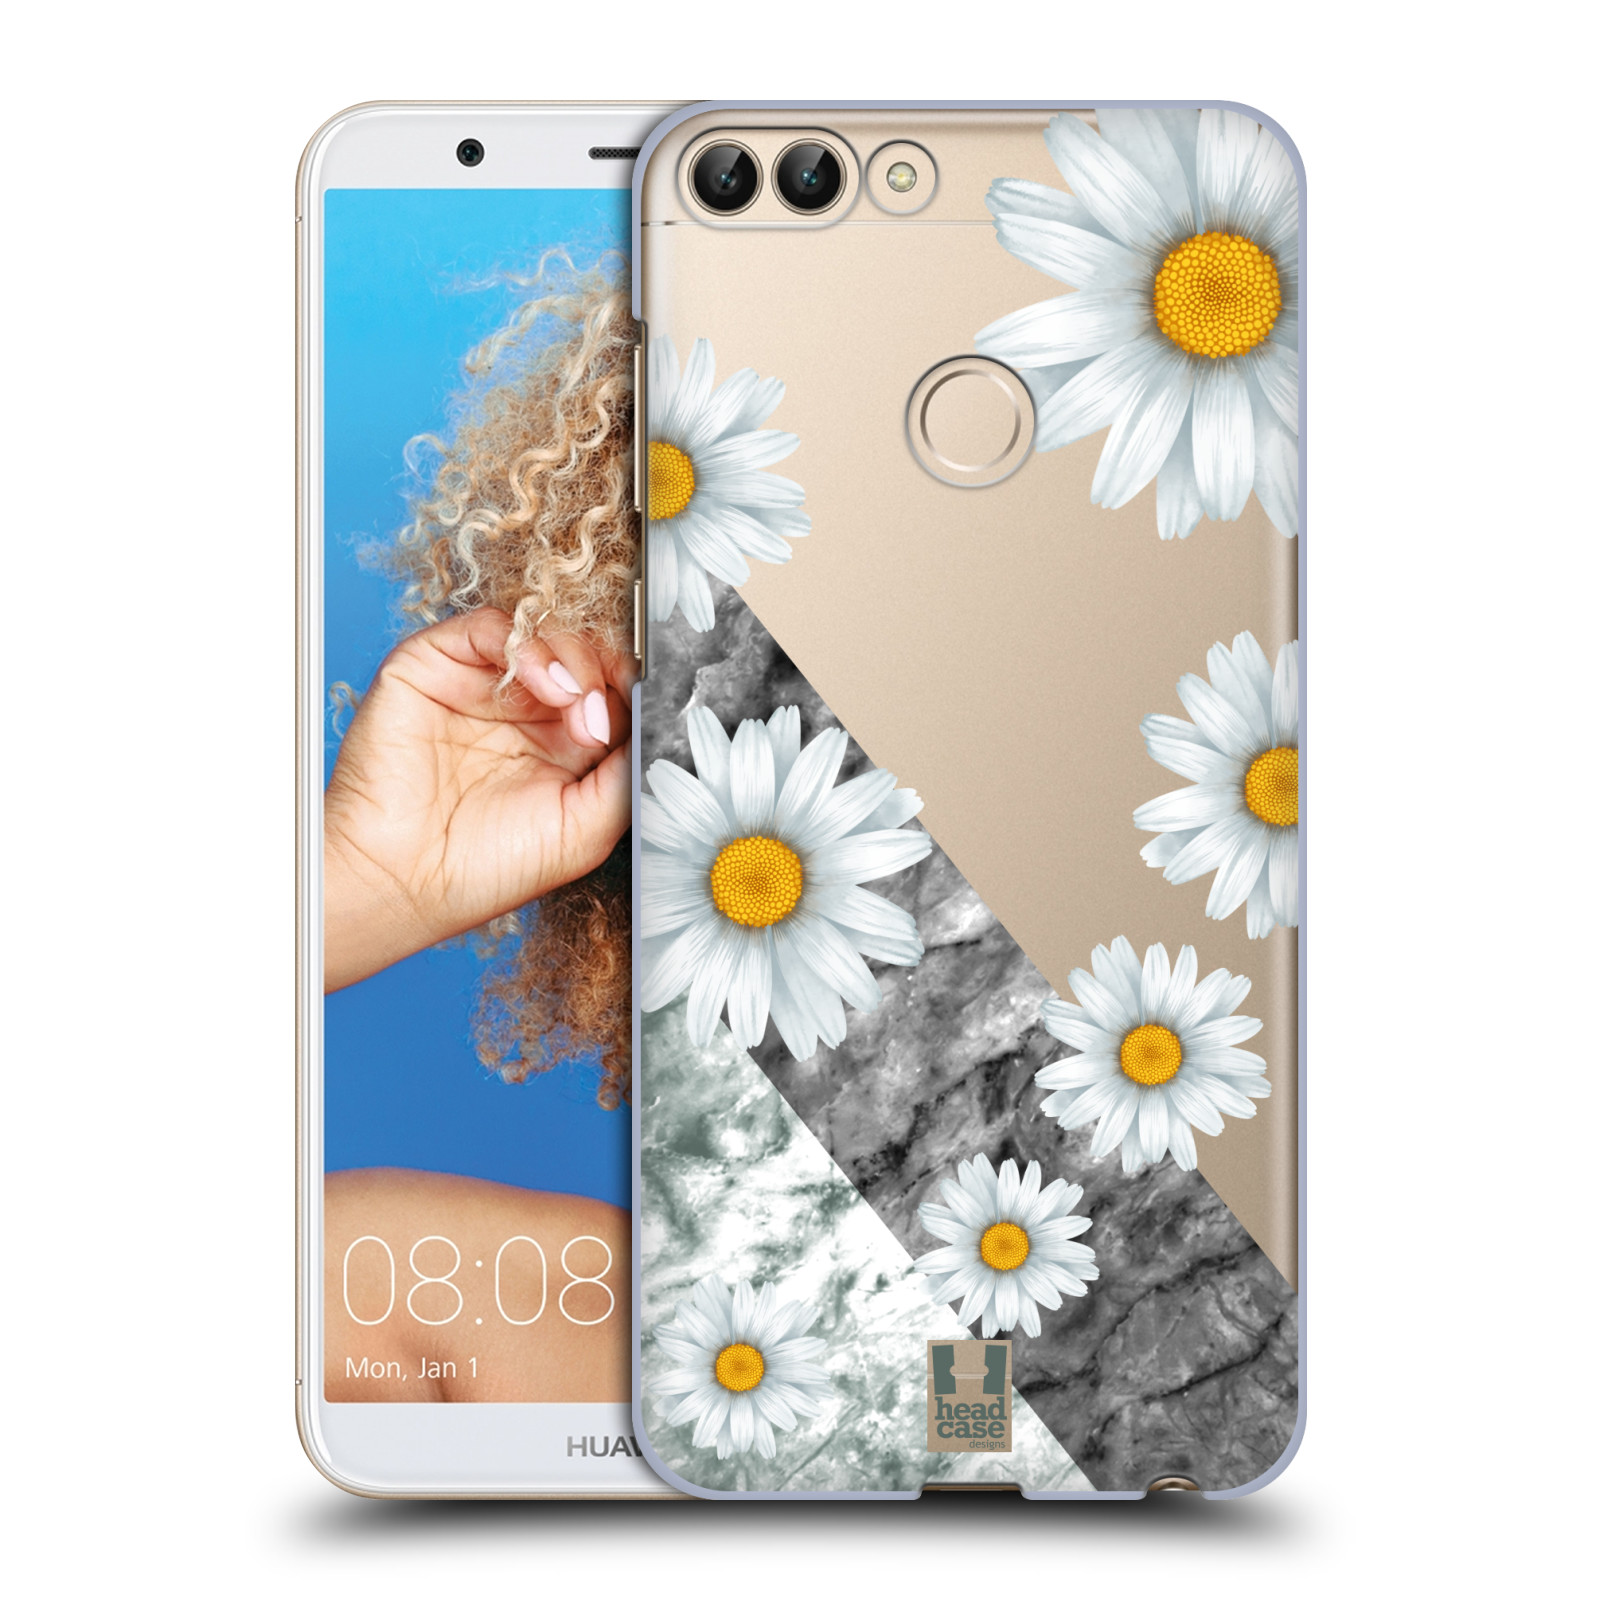 HEAD CASE plastový obal na mobil Huawei P Smart květina sedmikráska a mramor